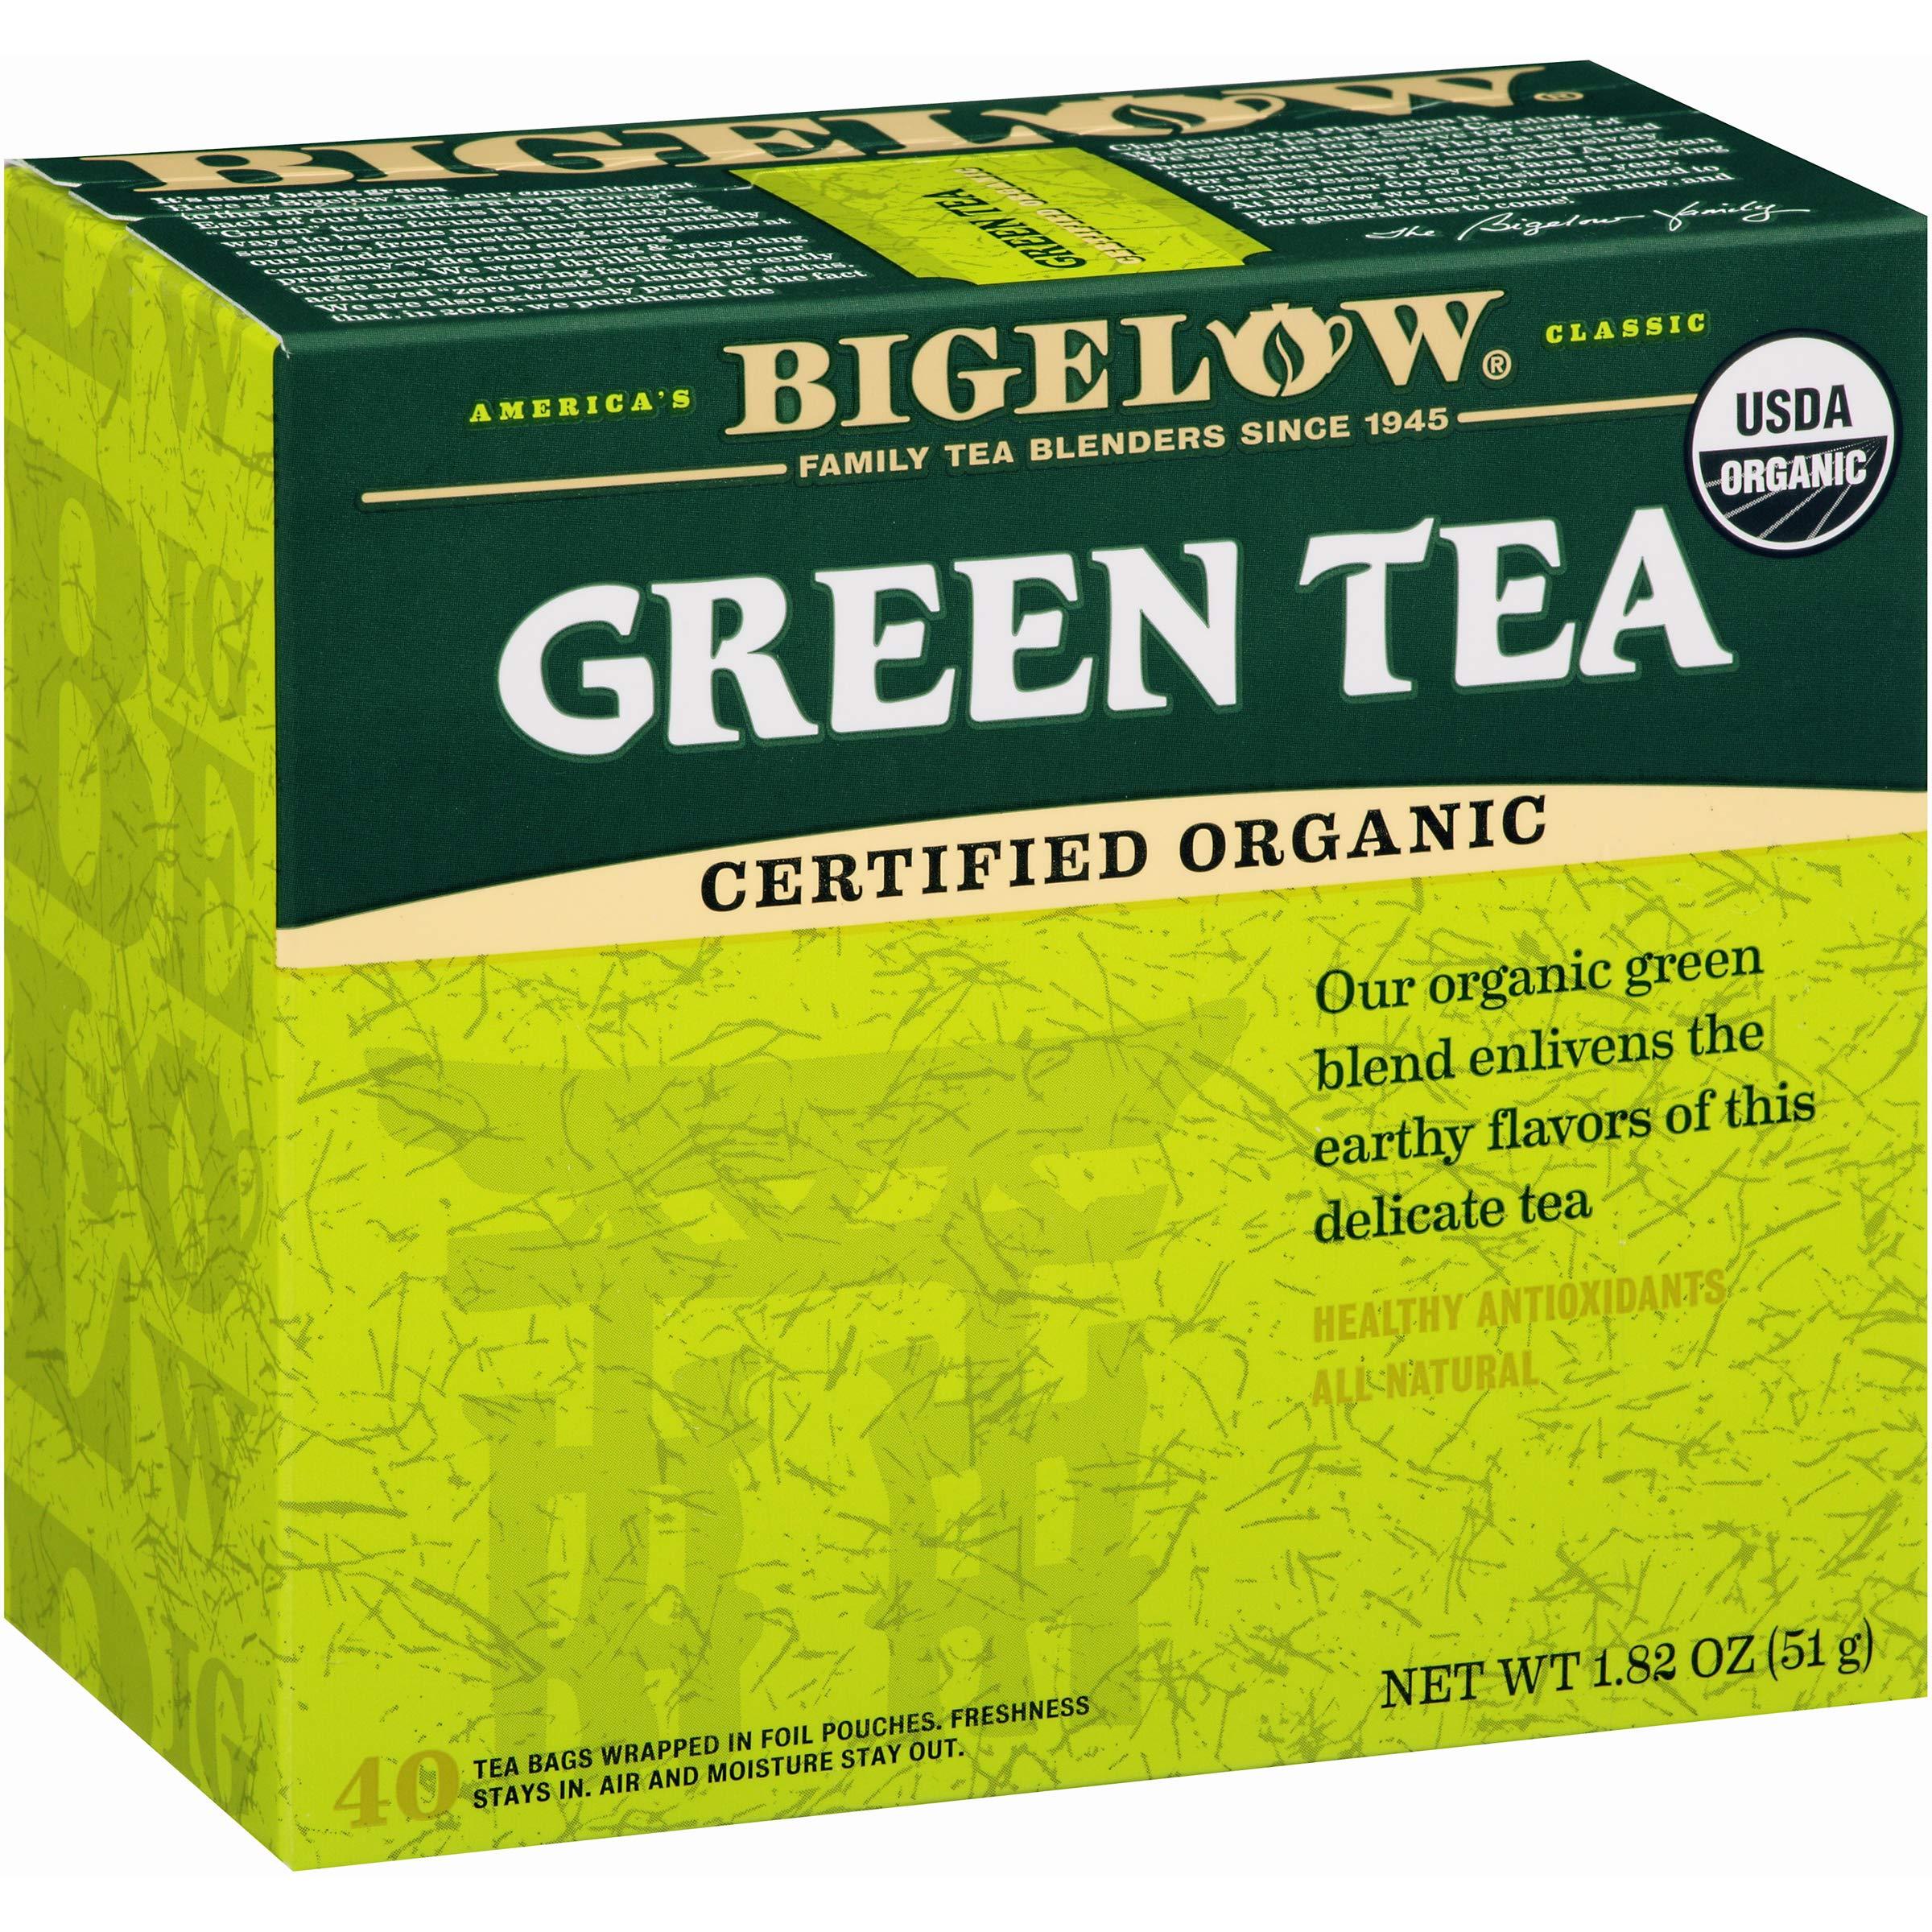 Bigelow Organic Green Tea 40 Bags (Pack of 6), 240 Tea Bags Total. Organic Caffeinated Individual Green Tea Bags, for Hot Tea or Iced Tea, Drink Plain or Sweetened with Honey or Sugar by Bigelow